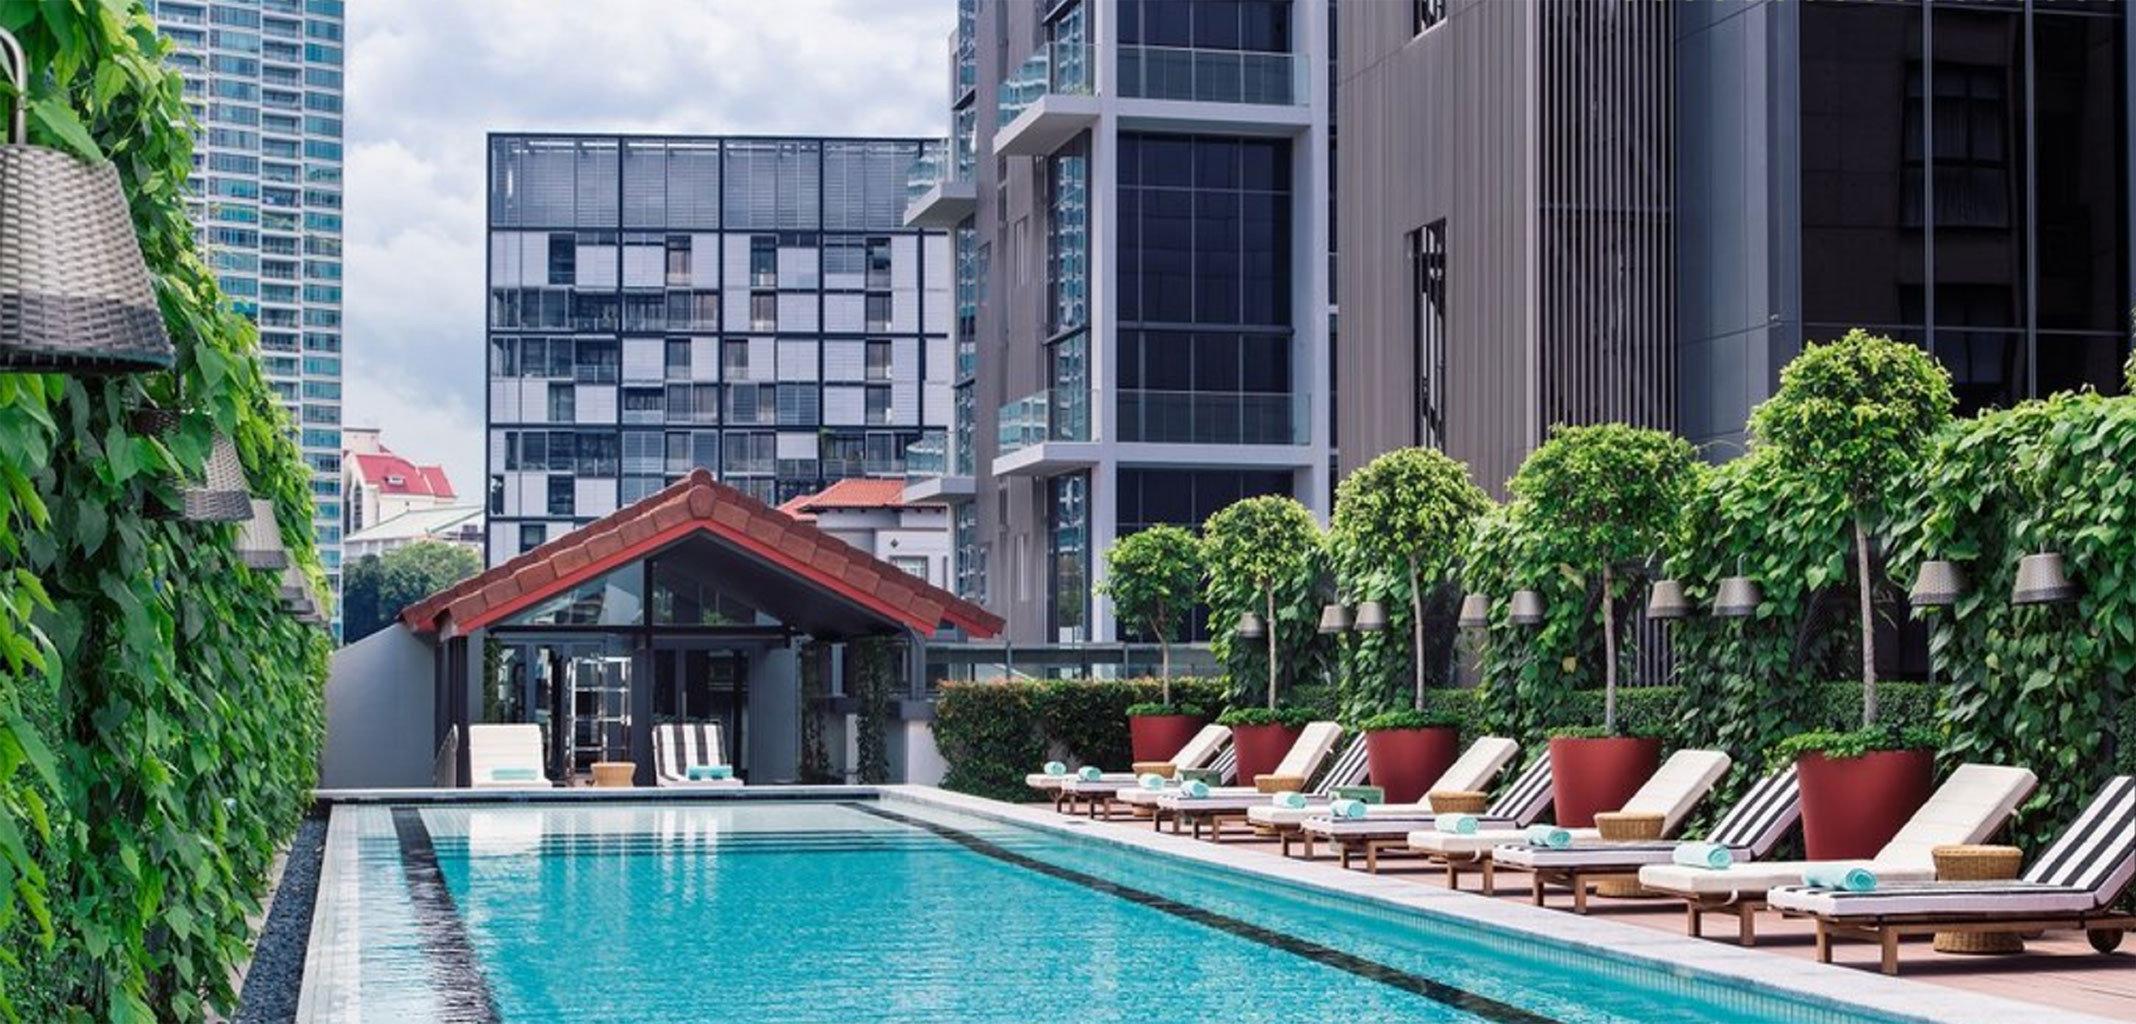 Hotels Romance building outdoor property house condominium swimming pool Pool home estate backyard Resort facade cottage Villa apartment Balcony